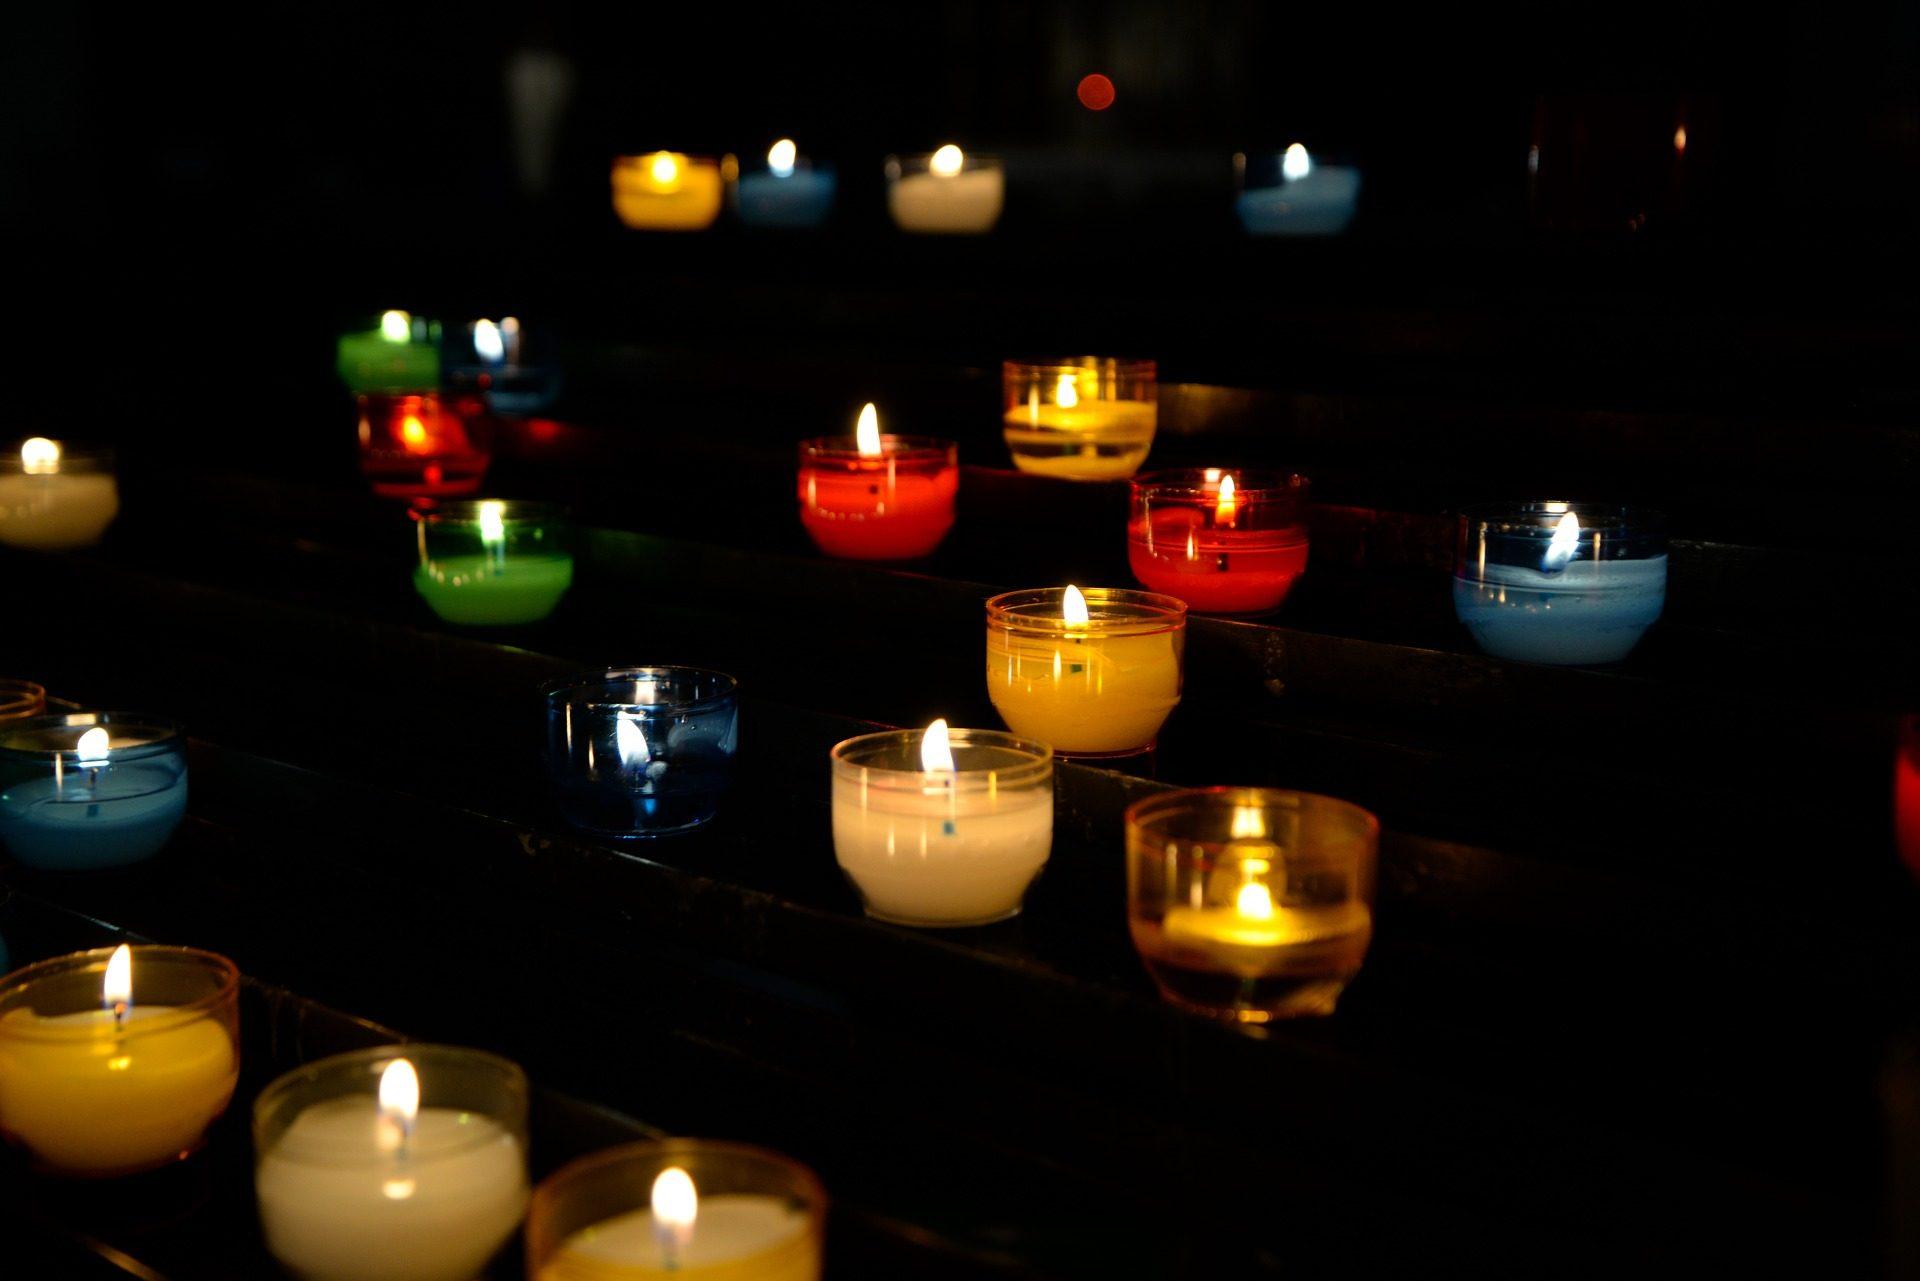 chandelles, flammes, lumières, ténèbres, coloré - Fonds d'écran HD - Professor-falken.com